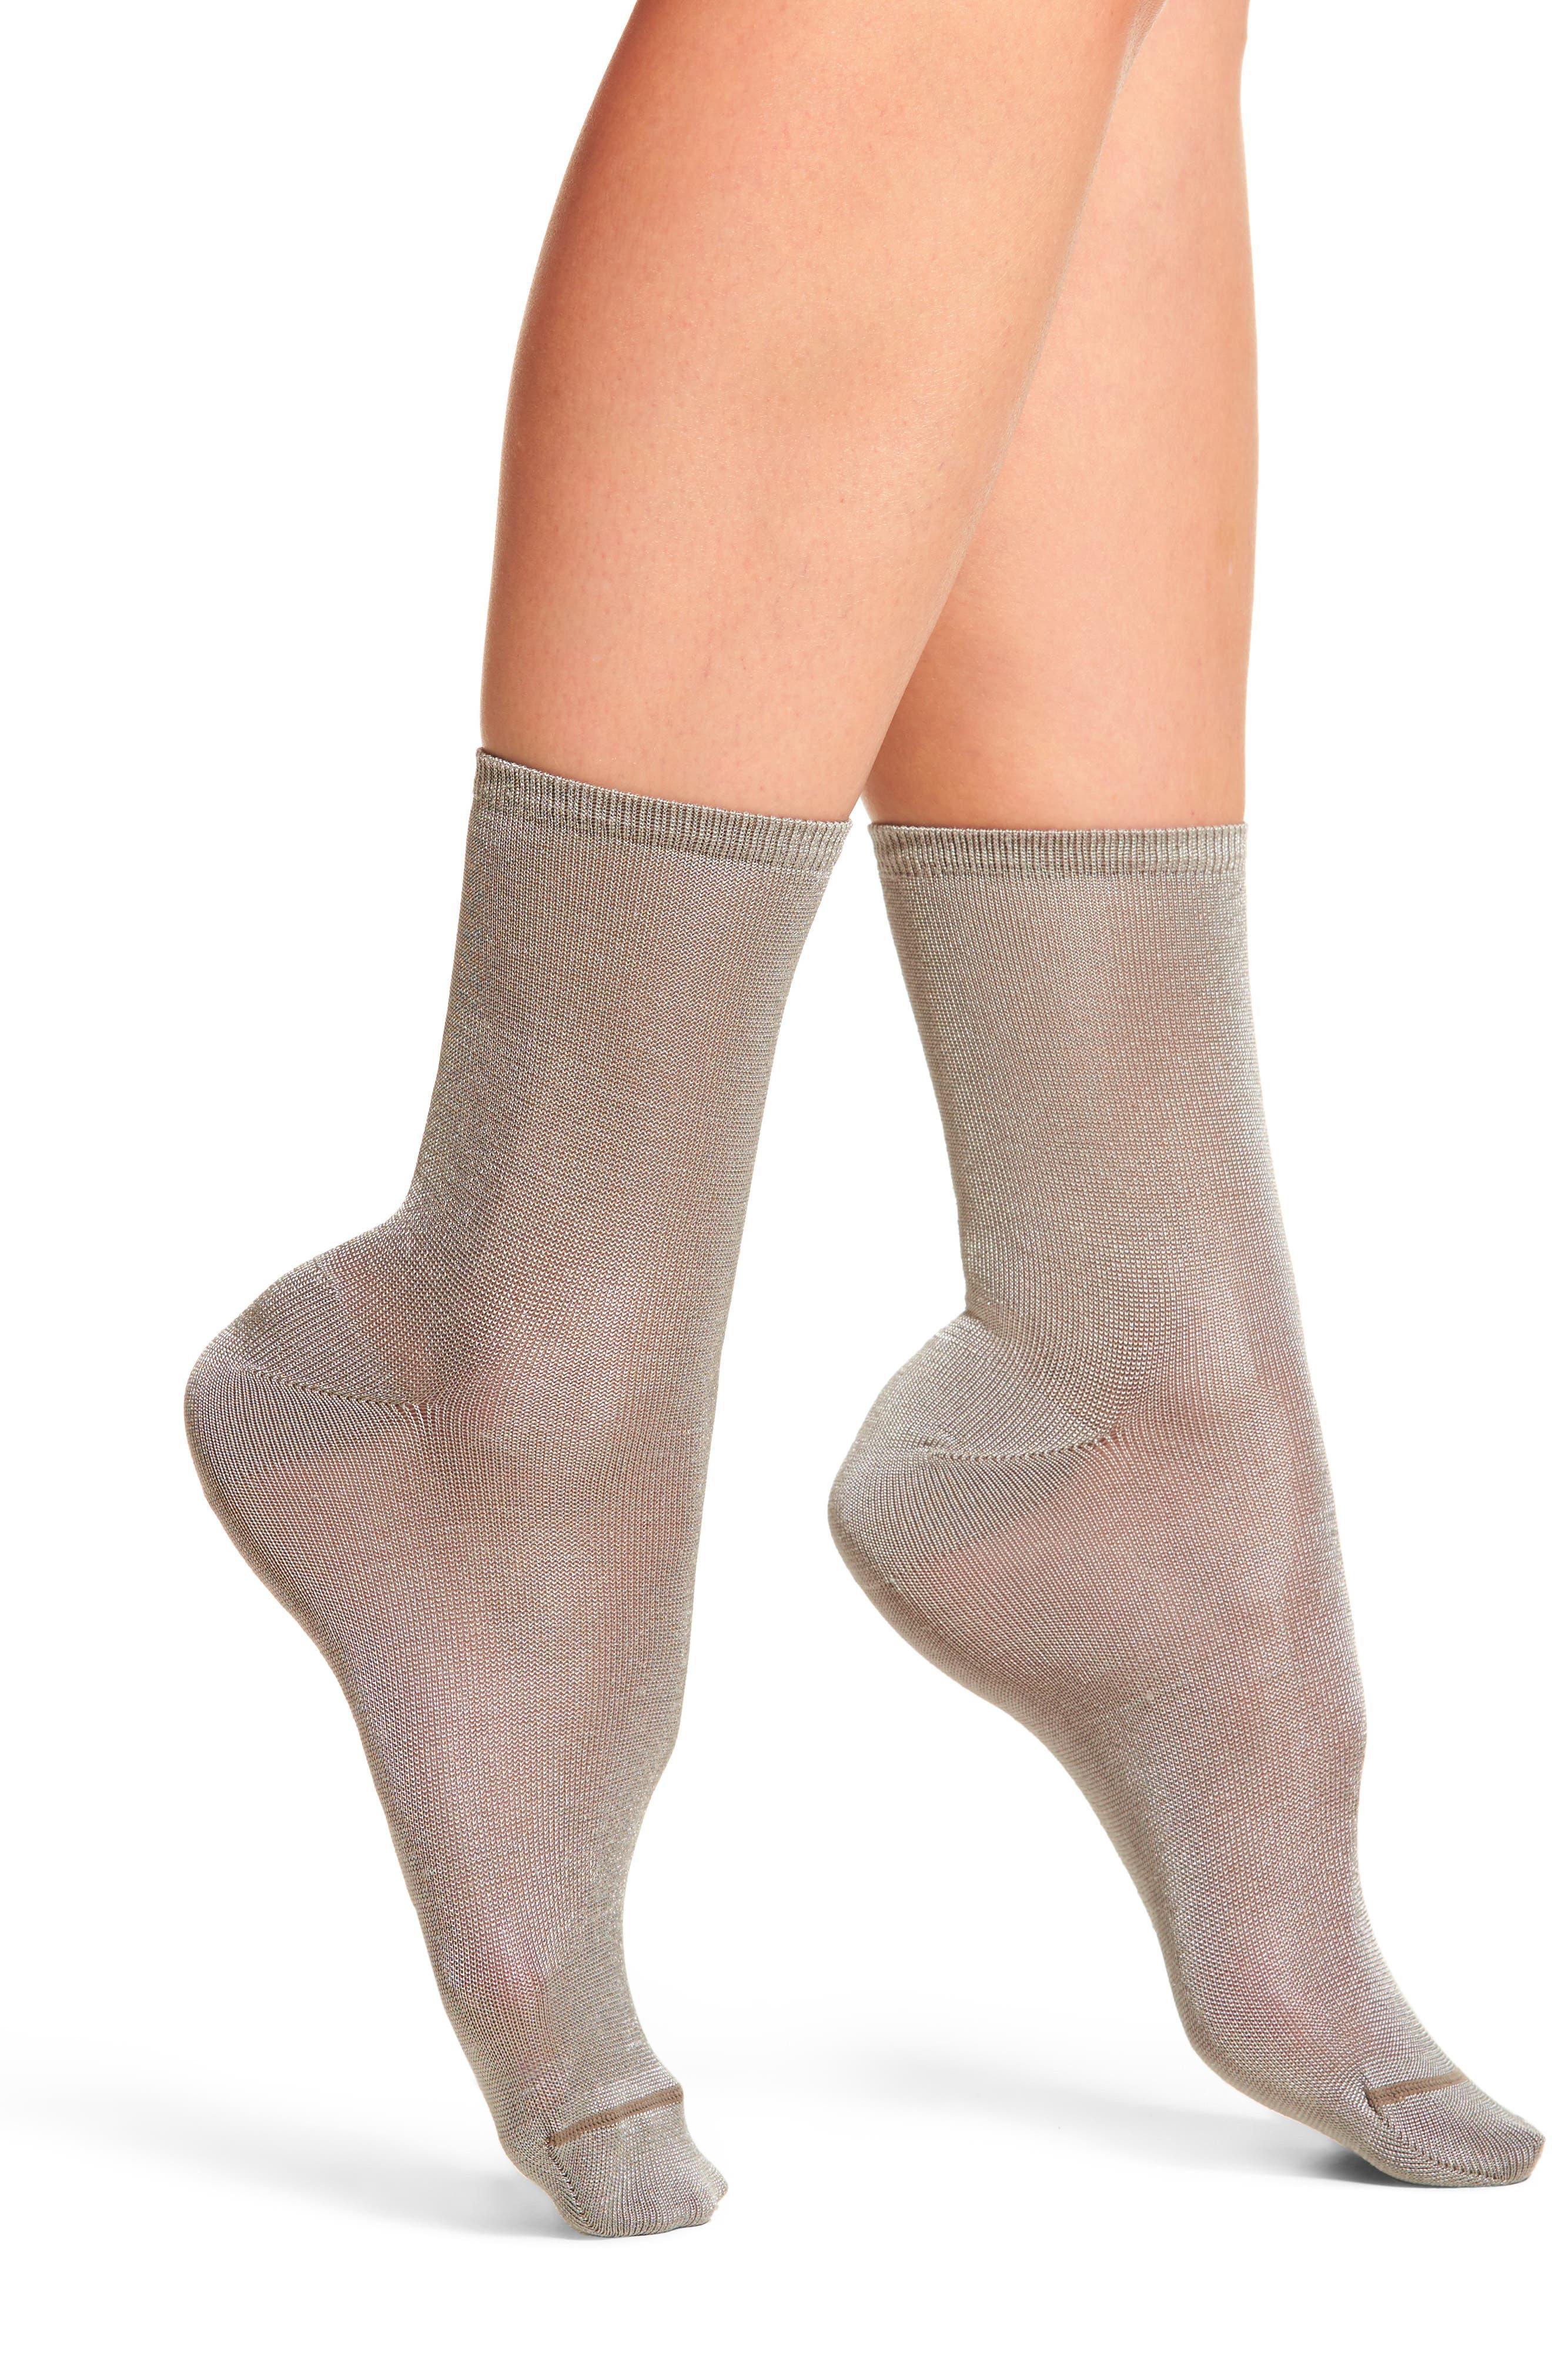 Sweetly Sheer Ankle Socks,                         Main,                         color, 020